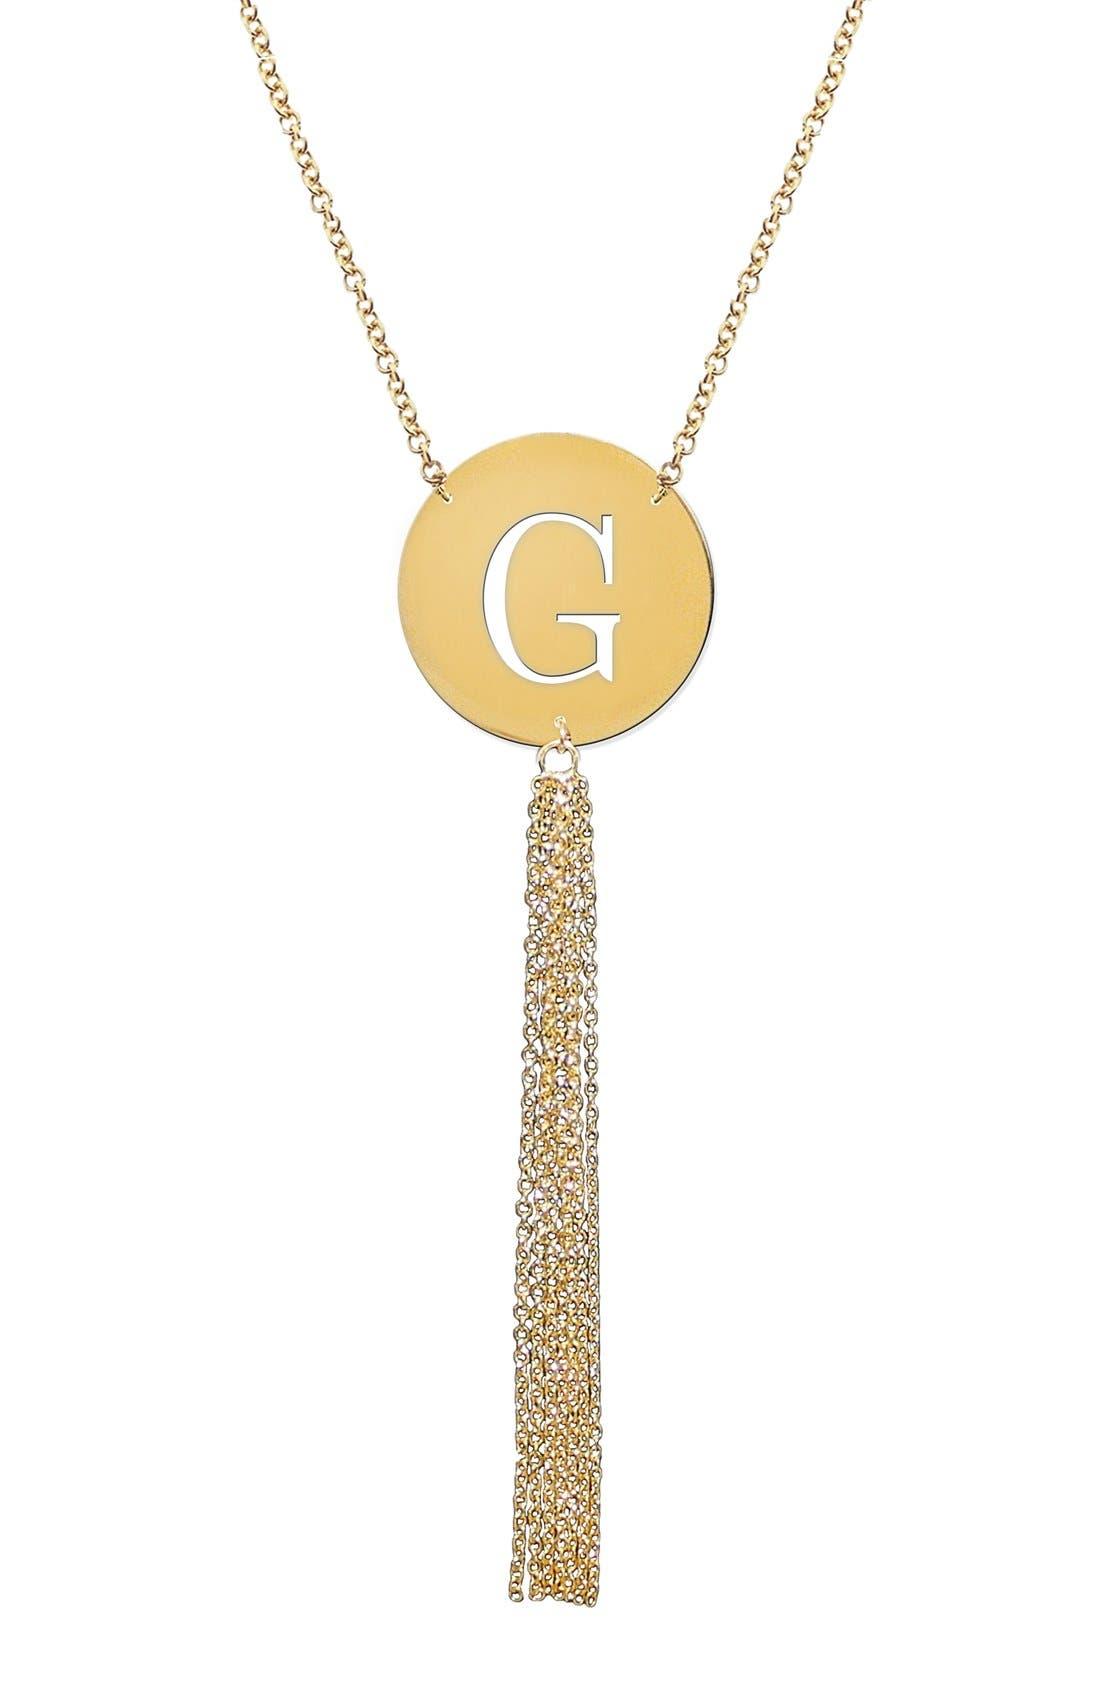 Alternate Image 1 Selected - Jane Basch Designs Initial Tassel Pendant Necklace